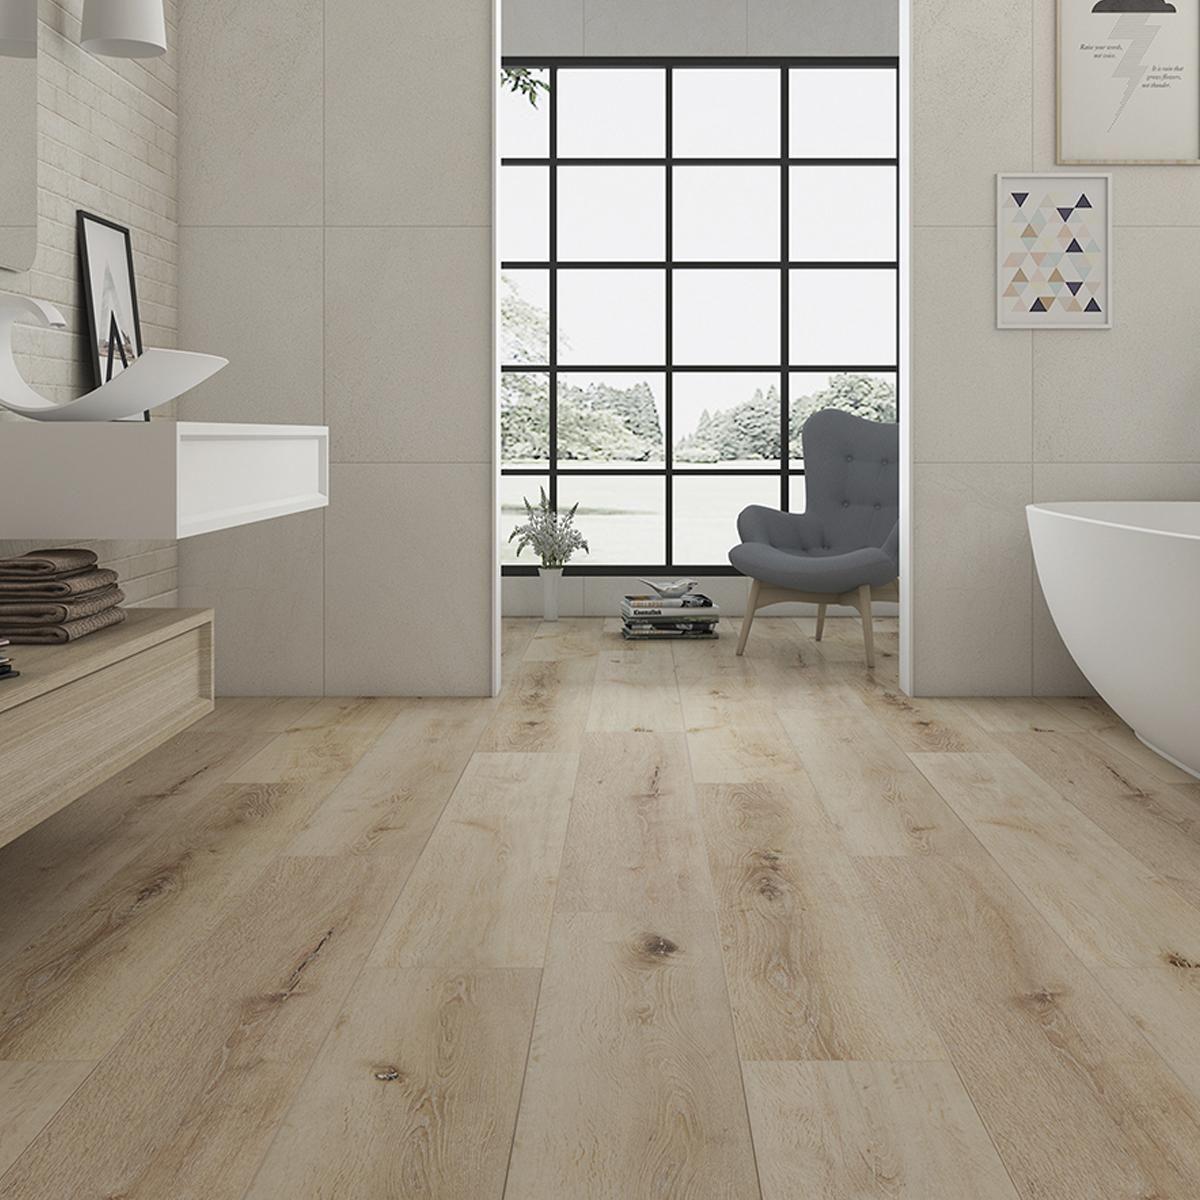 paramount vinyl plank grass rigidcore barley ridge flooring planks mart 7x48 types nfm